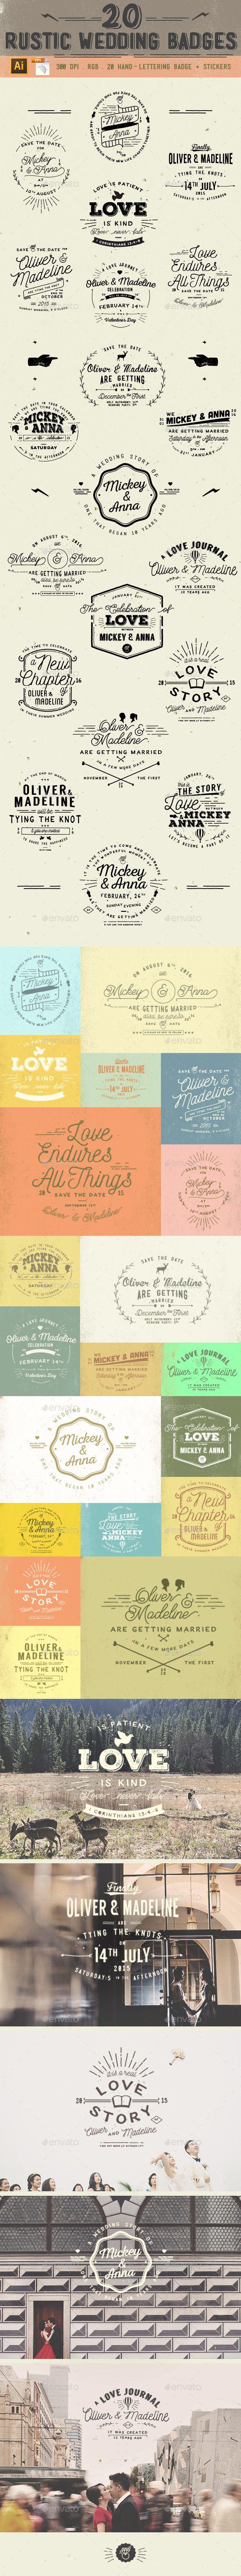 20 Rustic Wedding Badge #design #logos Download: http://graphicriver.net/item/20-rustic-wedding-badge/11795799?ref=ksioks